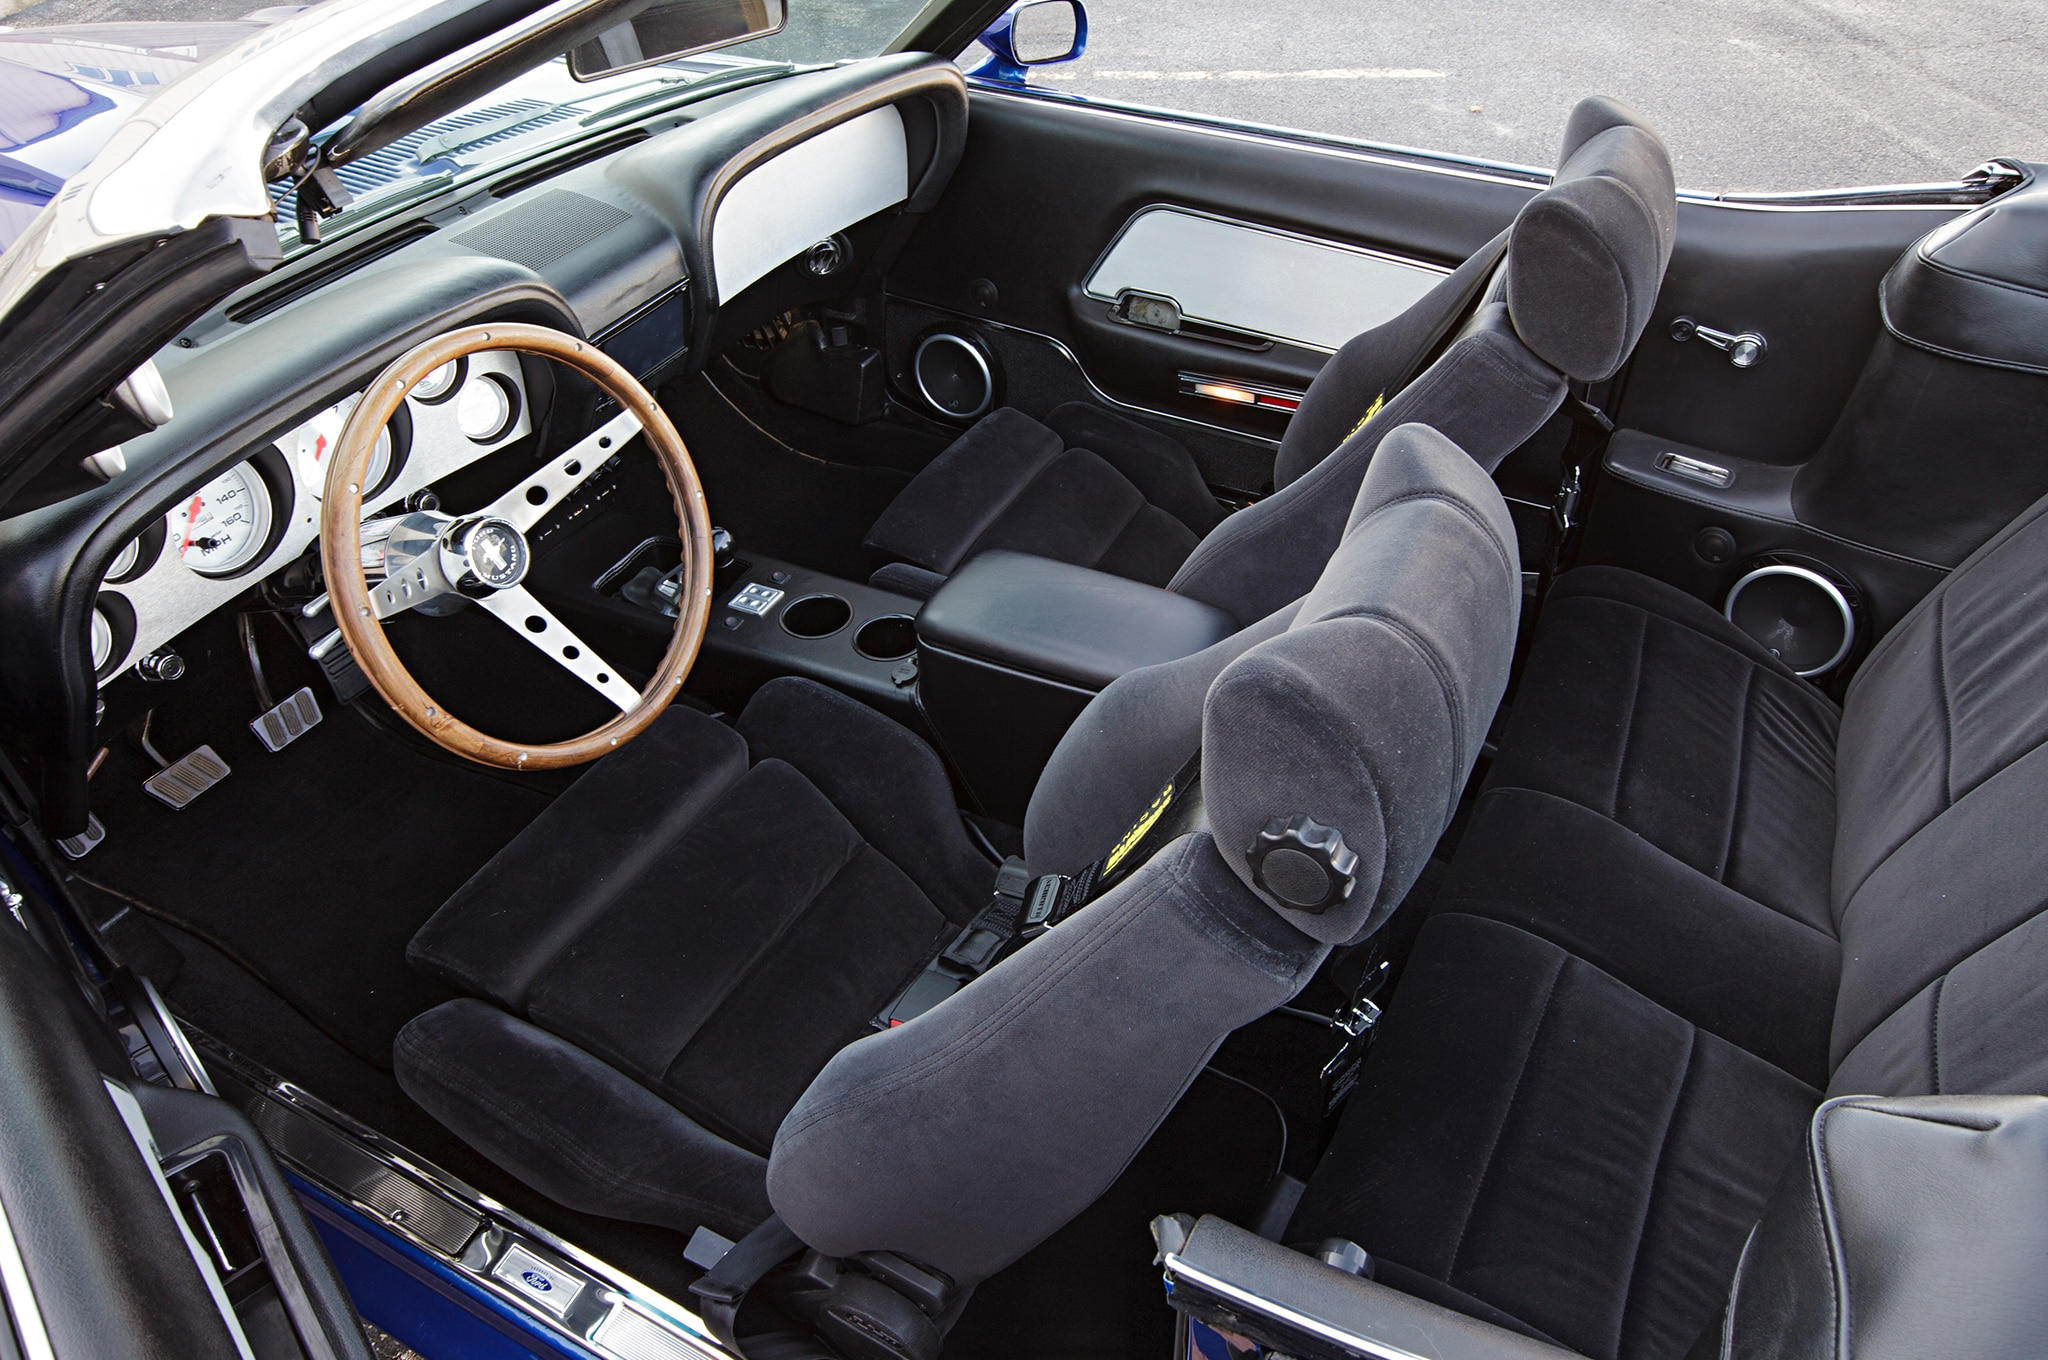 1969 Ford Mustang Interior